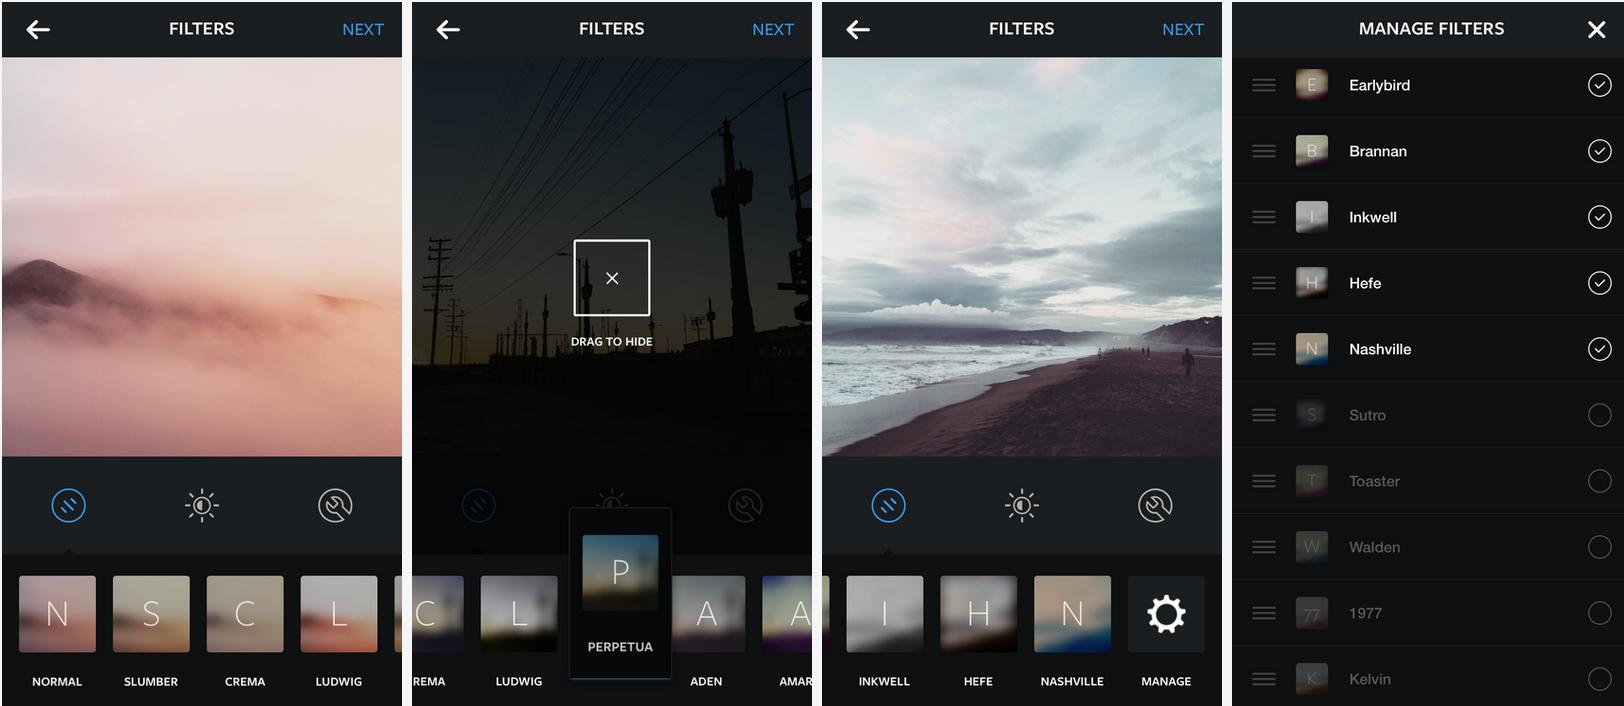 Instagram's new management tools